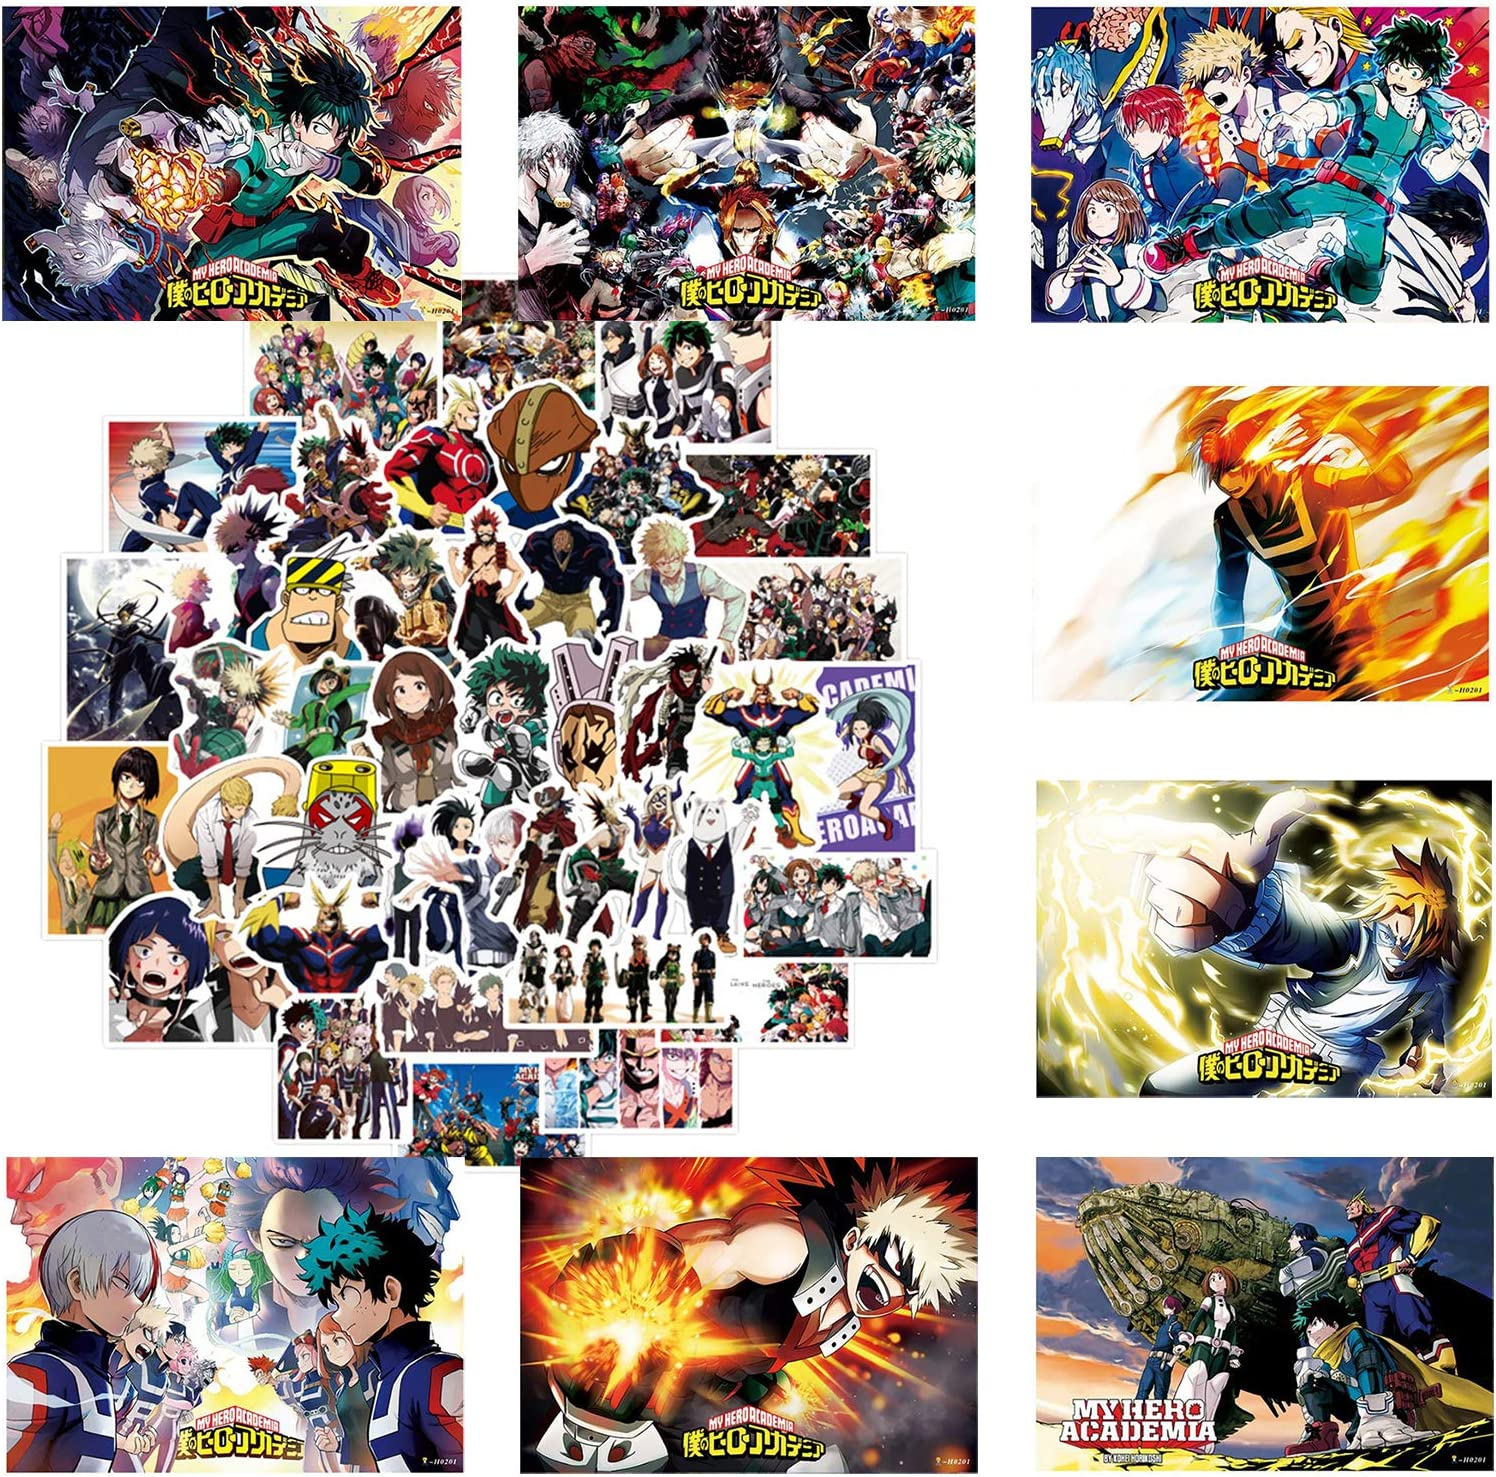 "My Hero Academia Wall Décor MHA Posters Anime Wall Posters for Fans 8 Pack MHA Posters 16.5"" x 11.5"" 50 Pieces MHA Stickers"